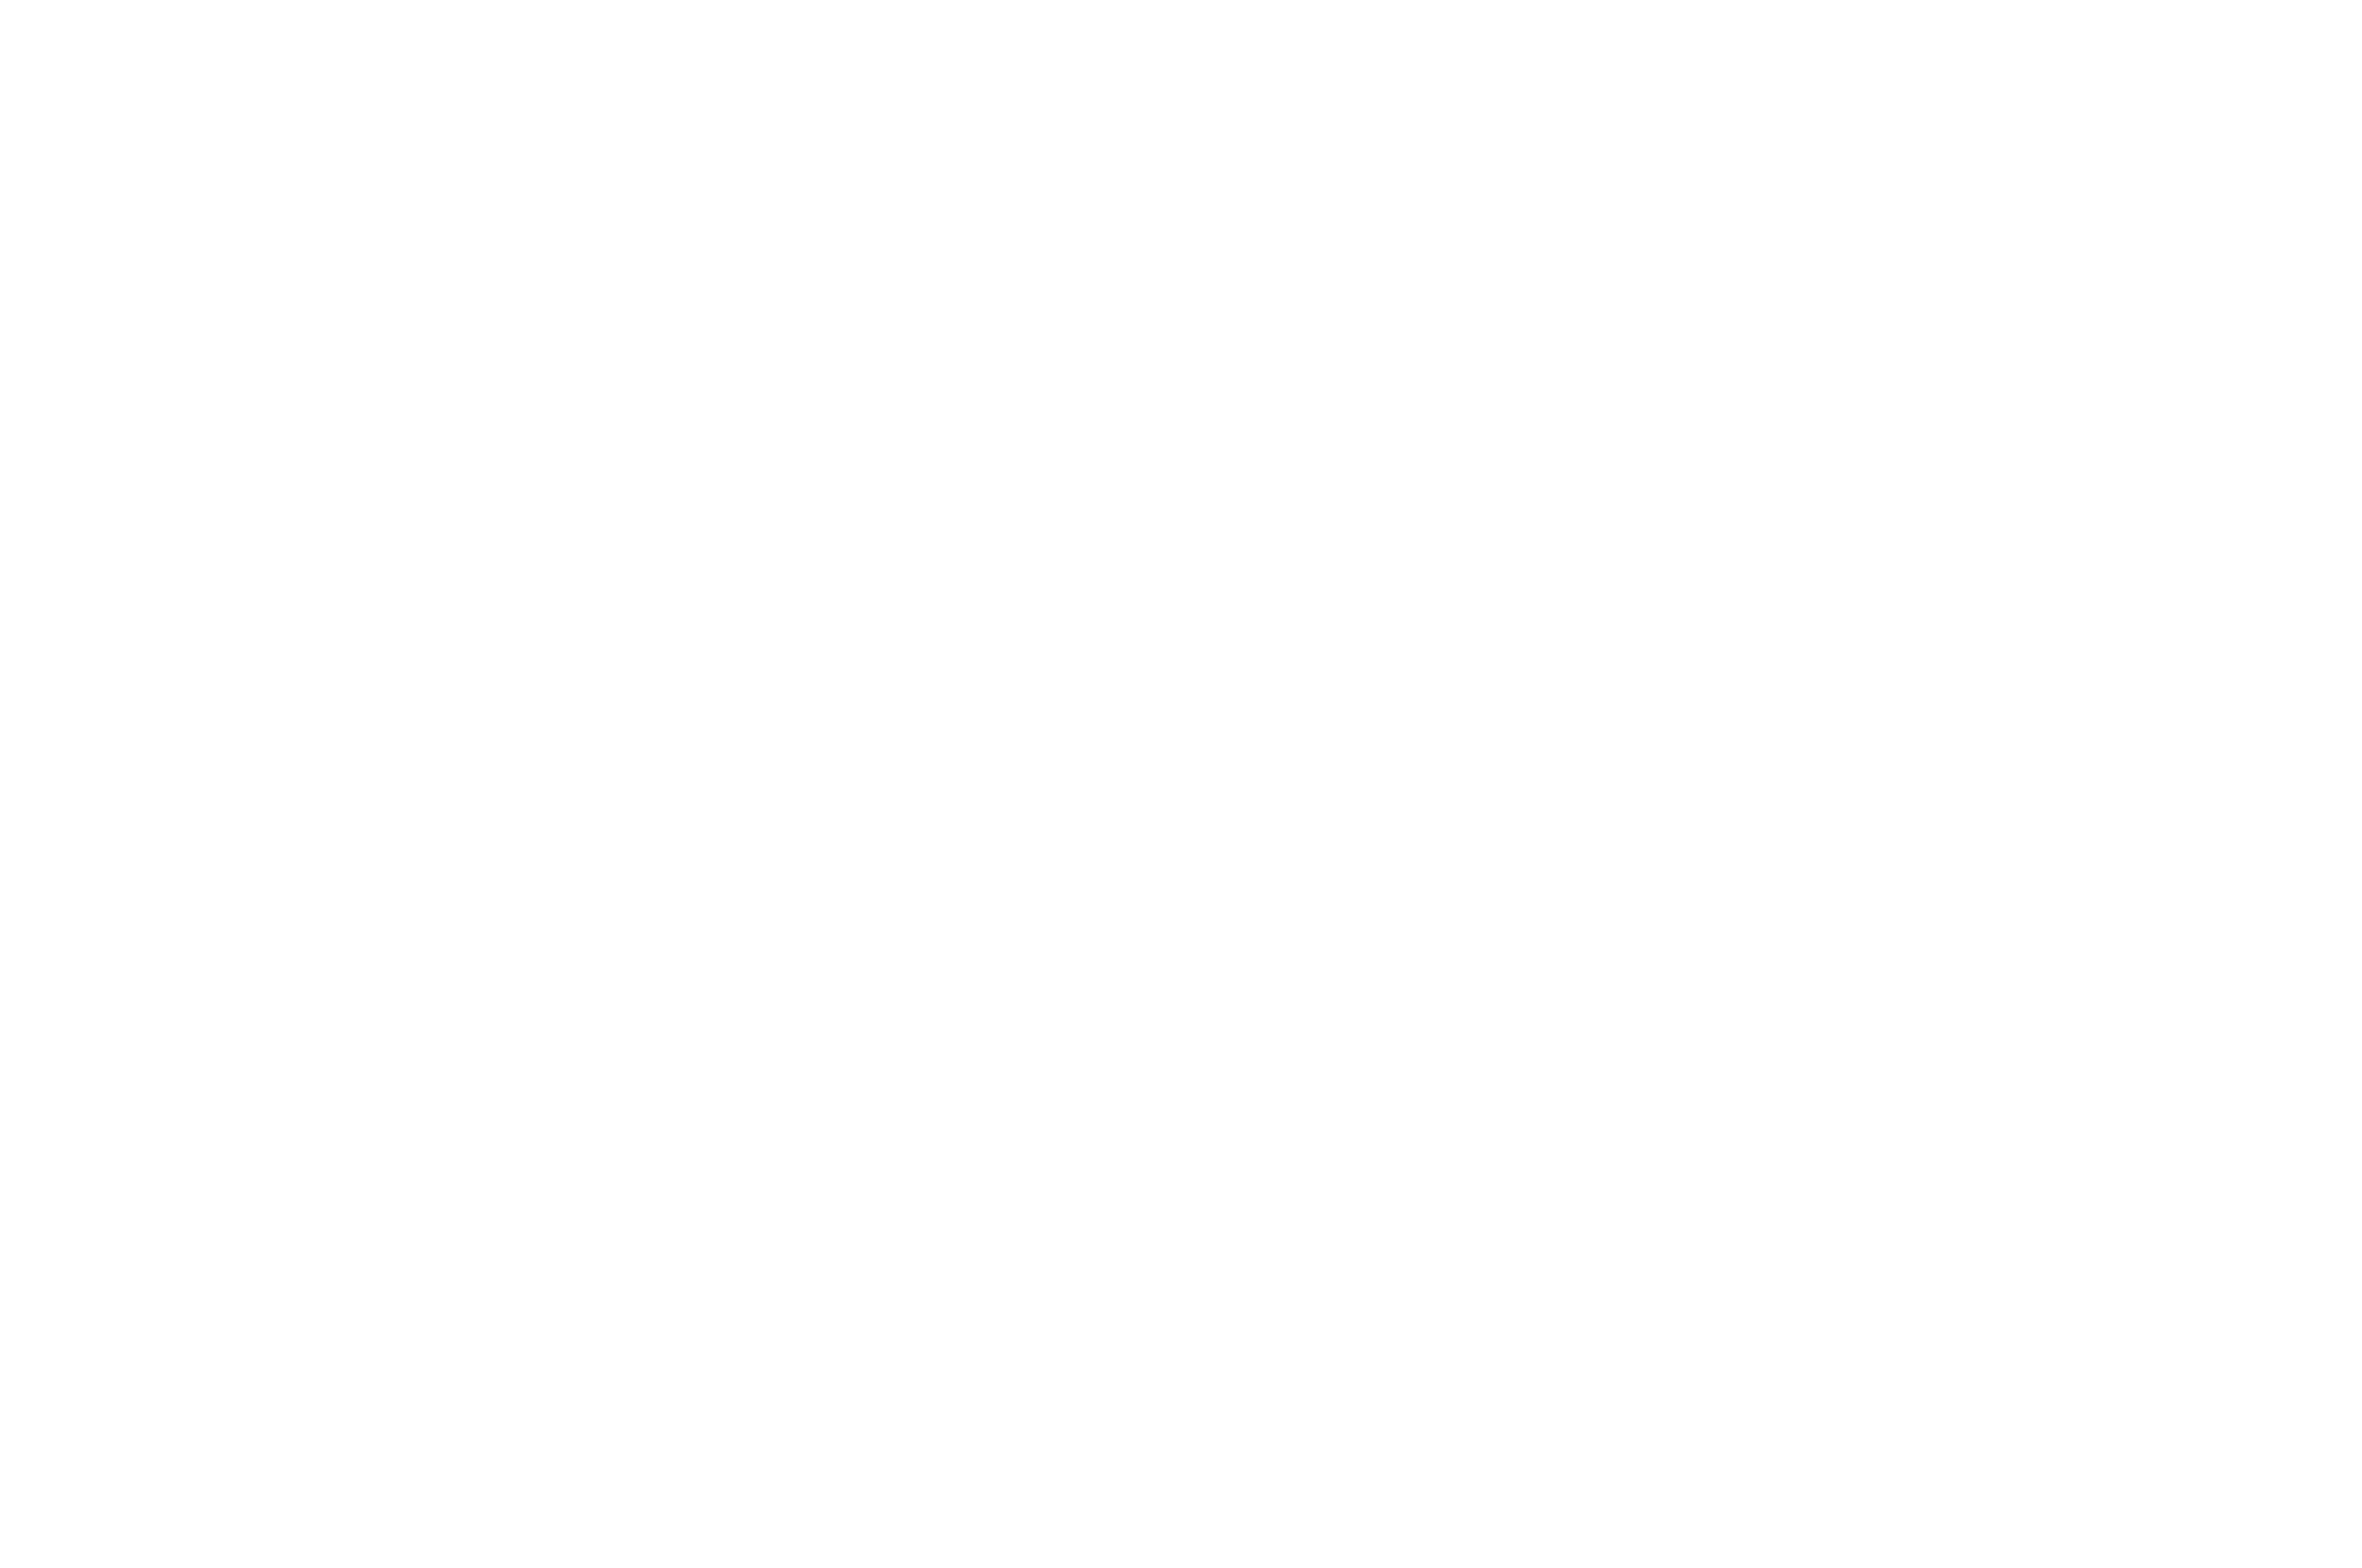 OFFICIALSELECTION-ATLANTAHORRORFILMFESTIVAL-2018.png